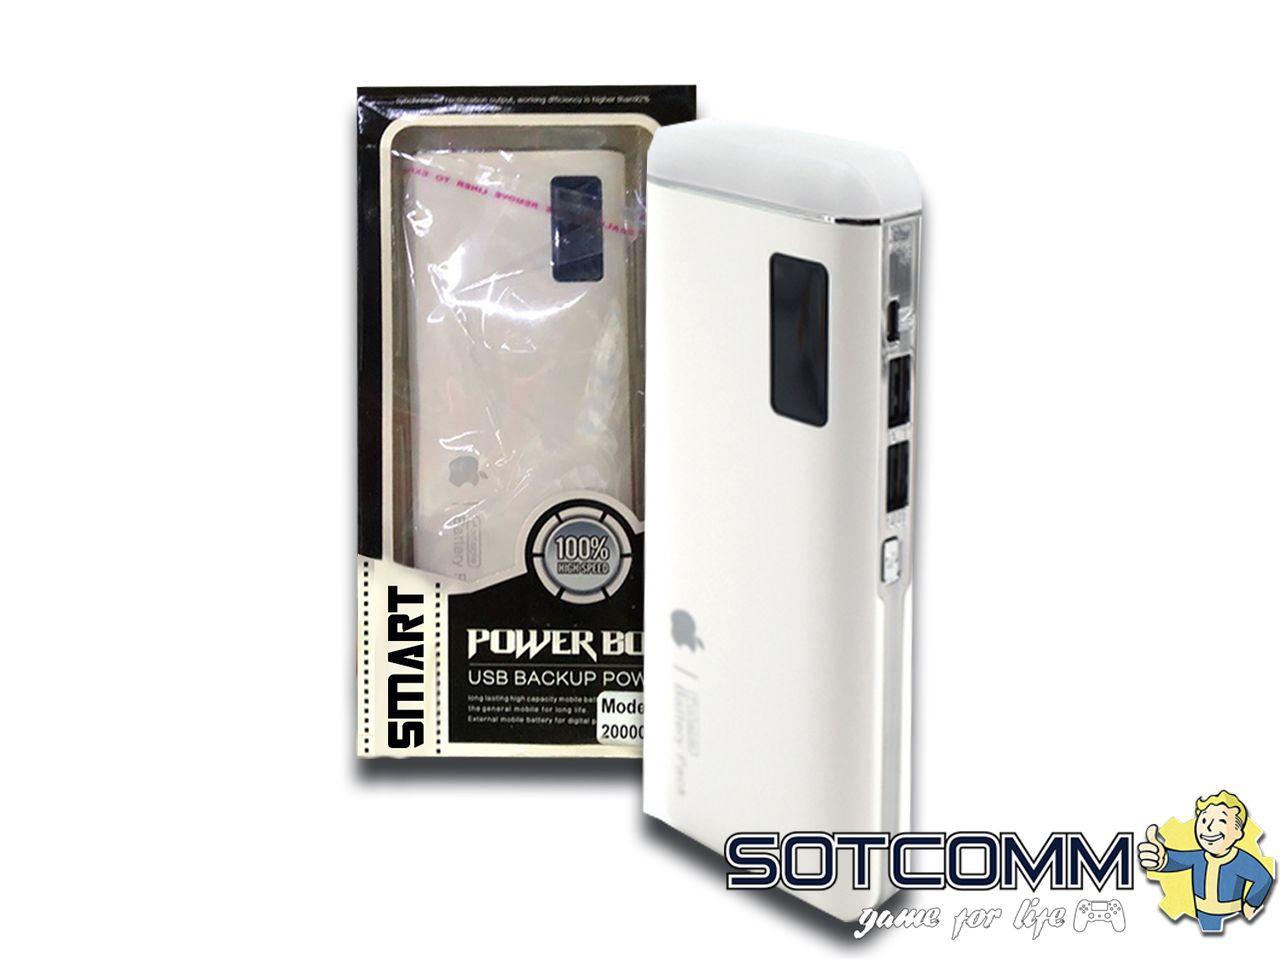 Power Bank W3 20000mAh 2 USB